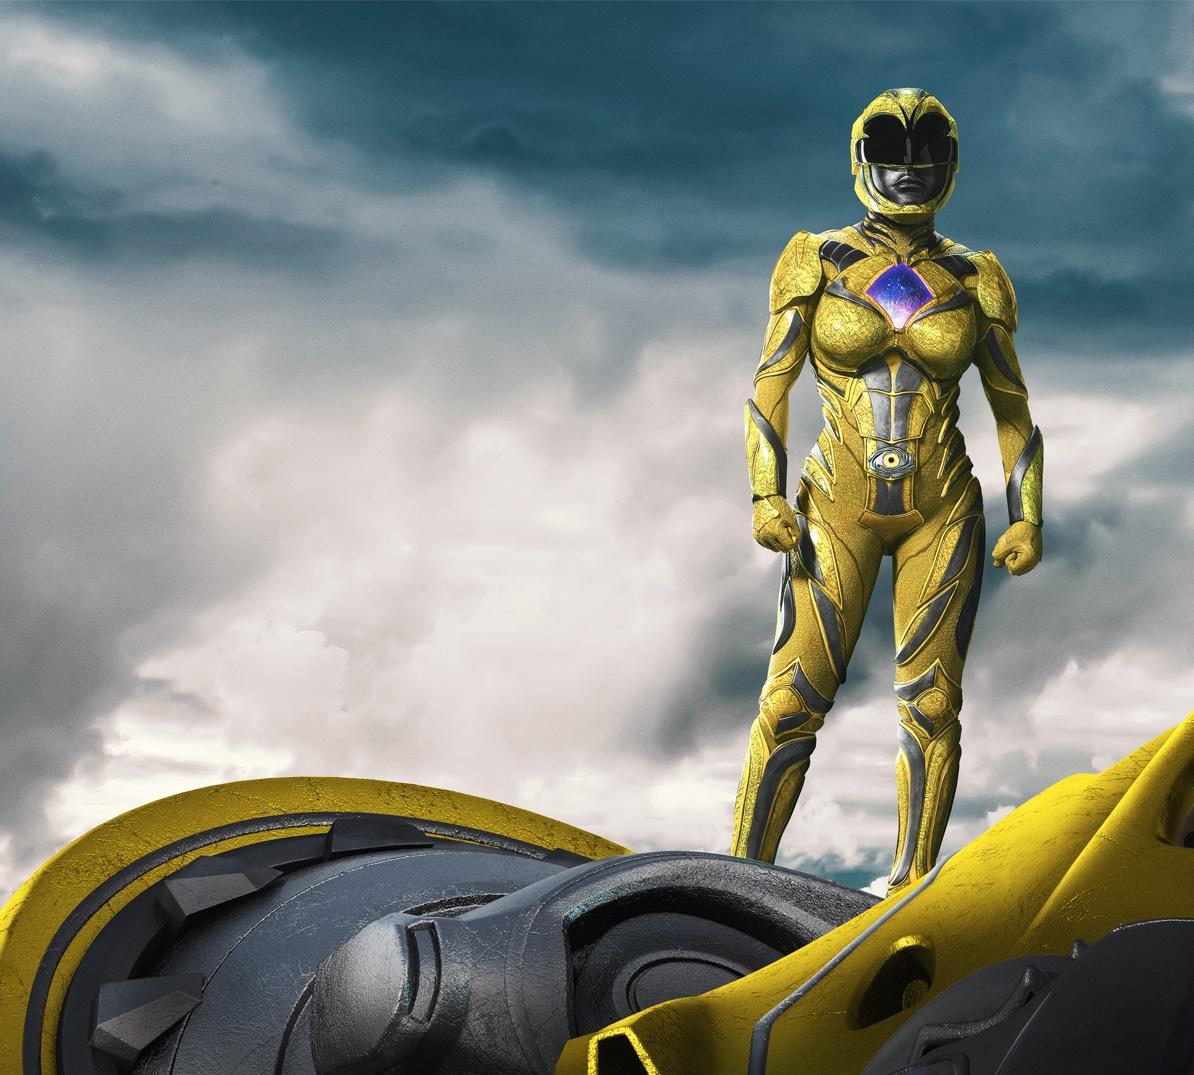 File:17-yellow.jpg